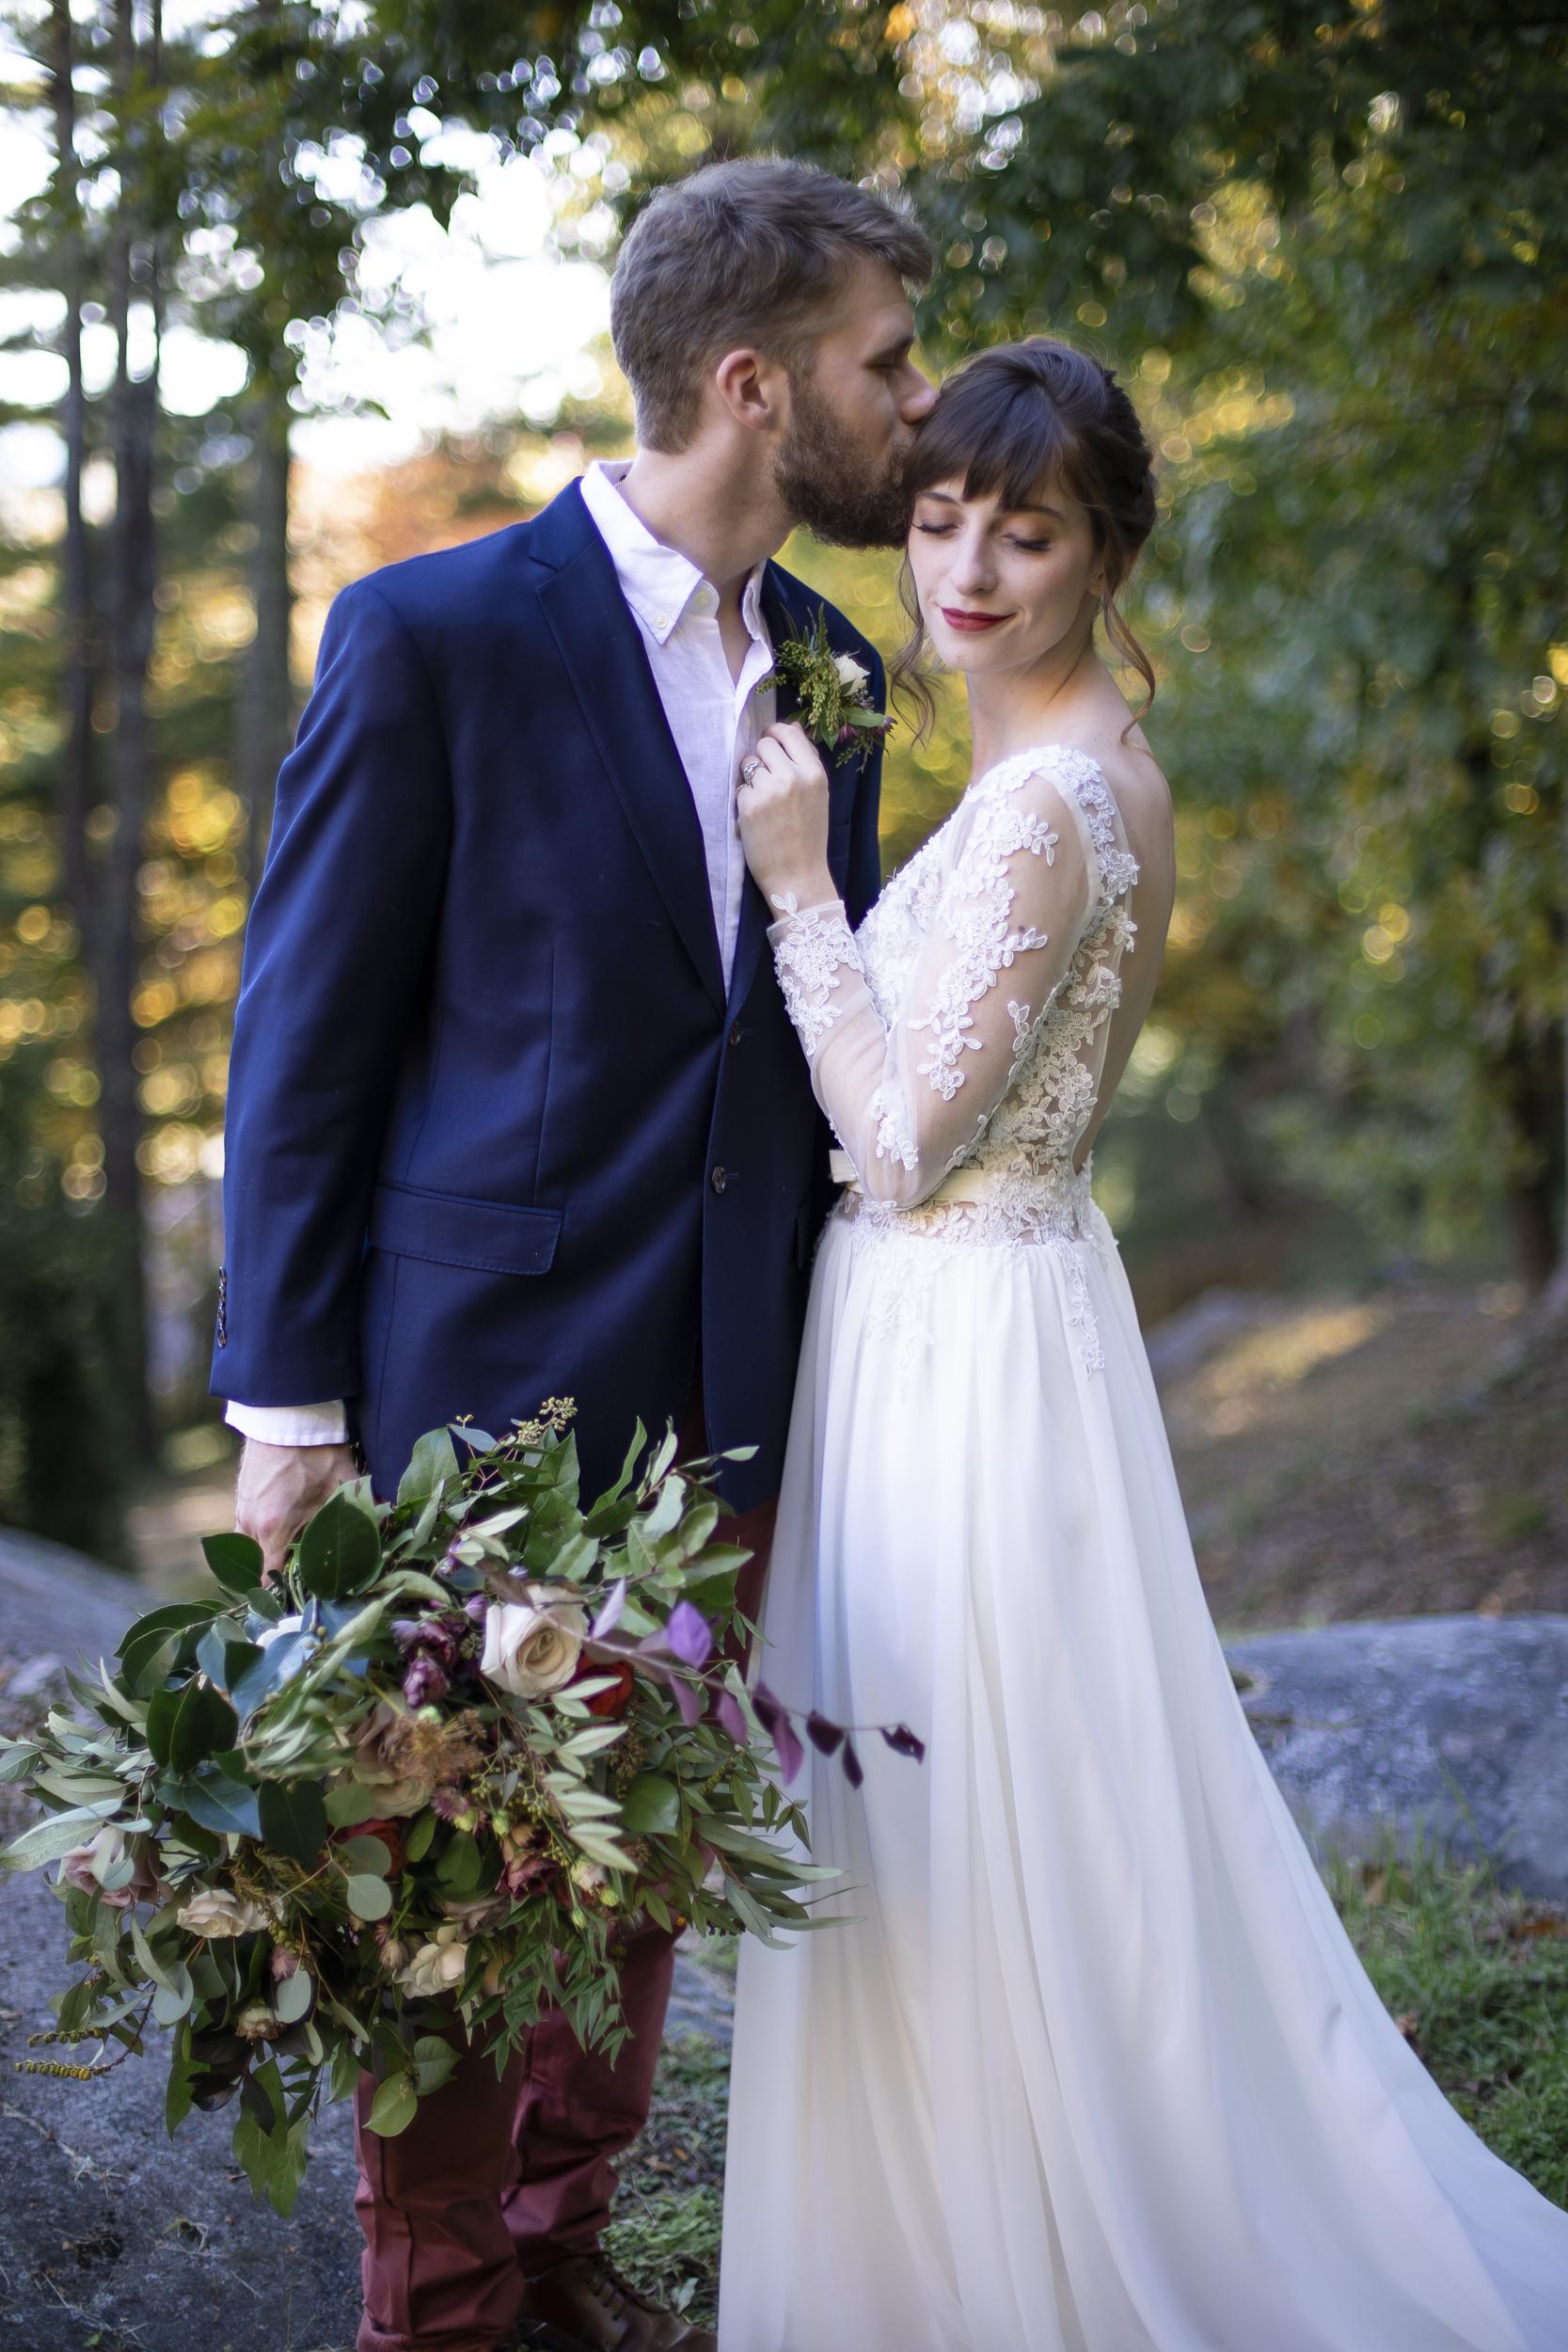 Laurel Falls Wedding October 2018_Allison and Josh__Lola Salon_Flora_Photo by Studio Misha Photography-39.jpg